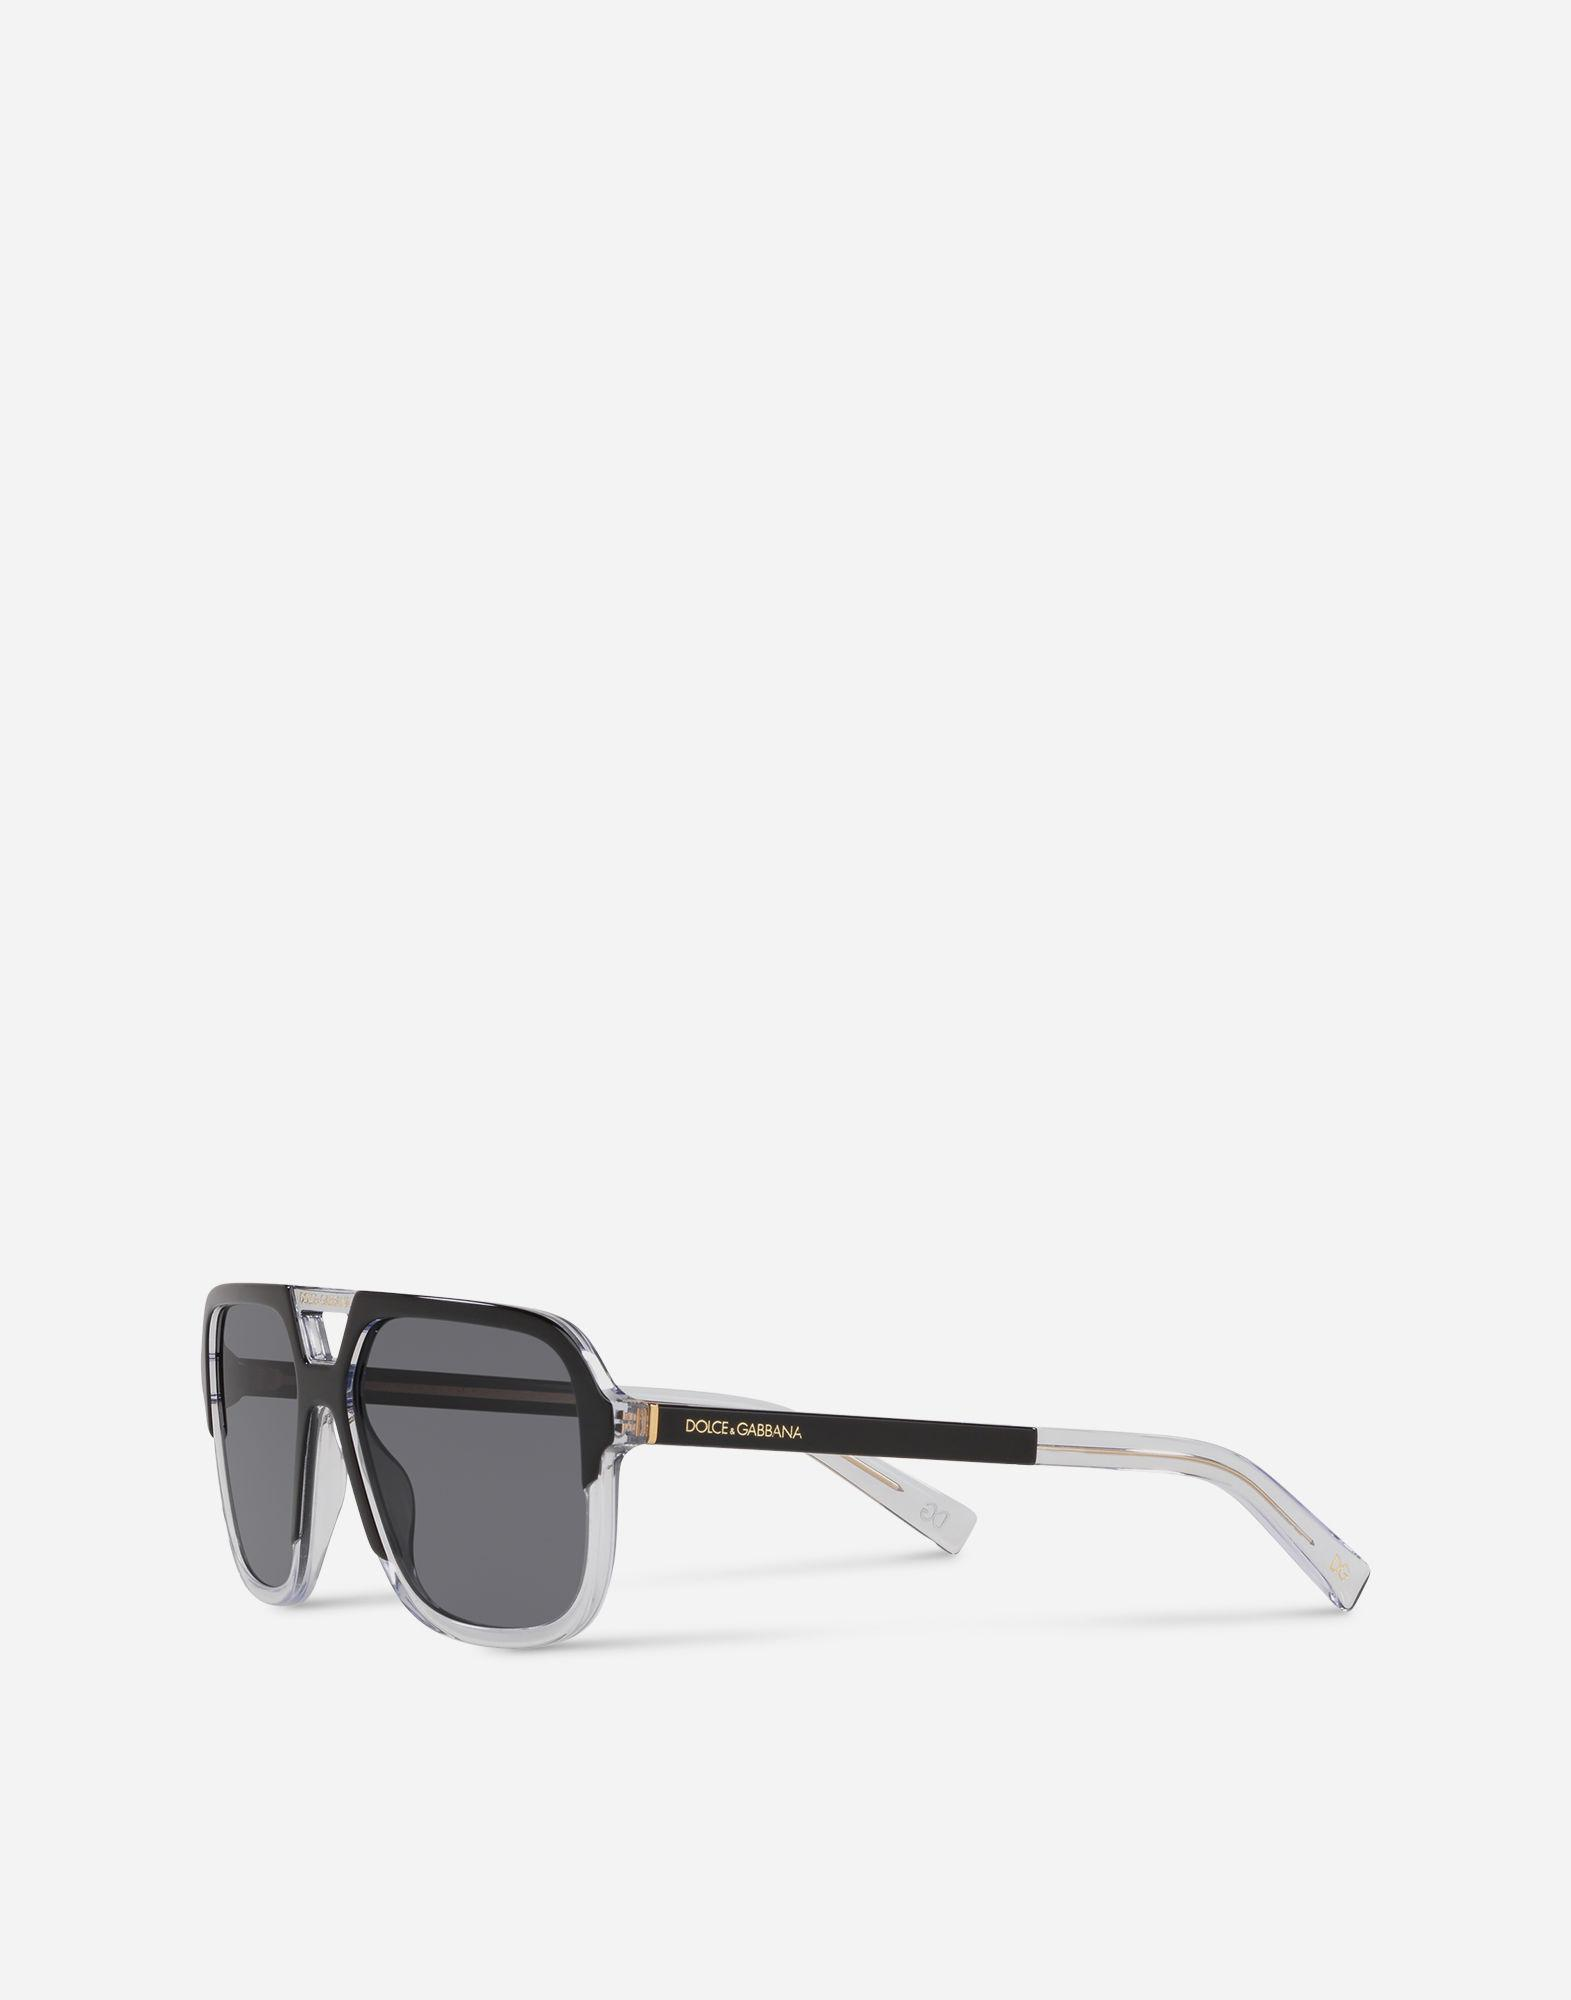 7368ee01d48 Lyst - Dolce   Gabbana Angel Sunglasses in Black for Men